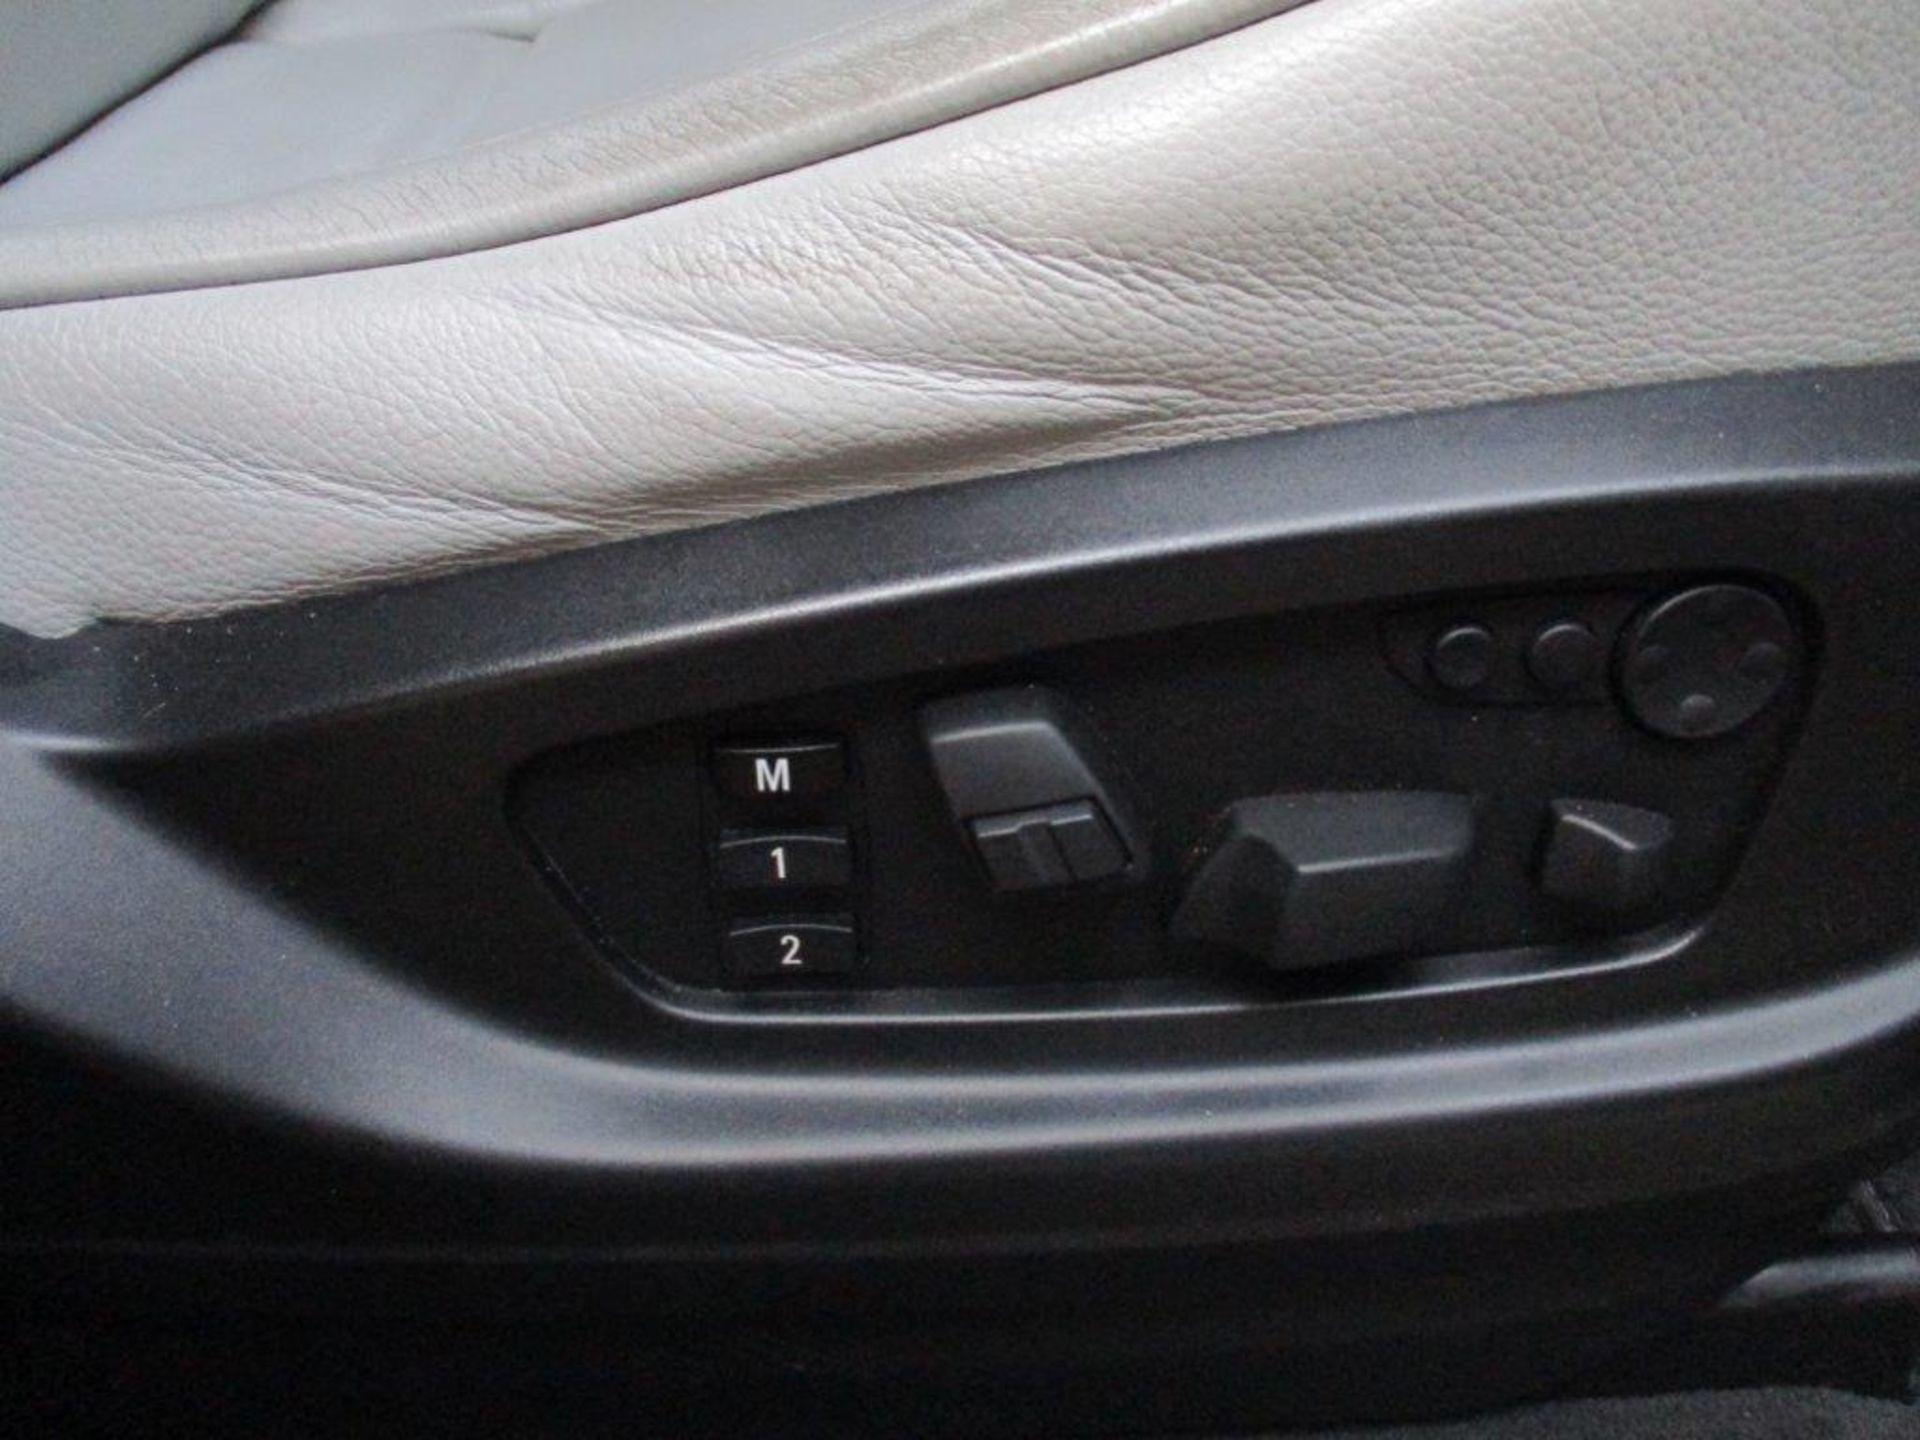 60 10 BMW X5 M Turbo Auto - Image 24 of 35